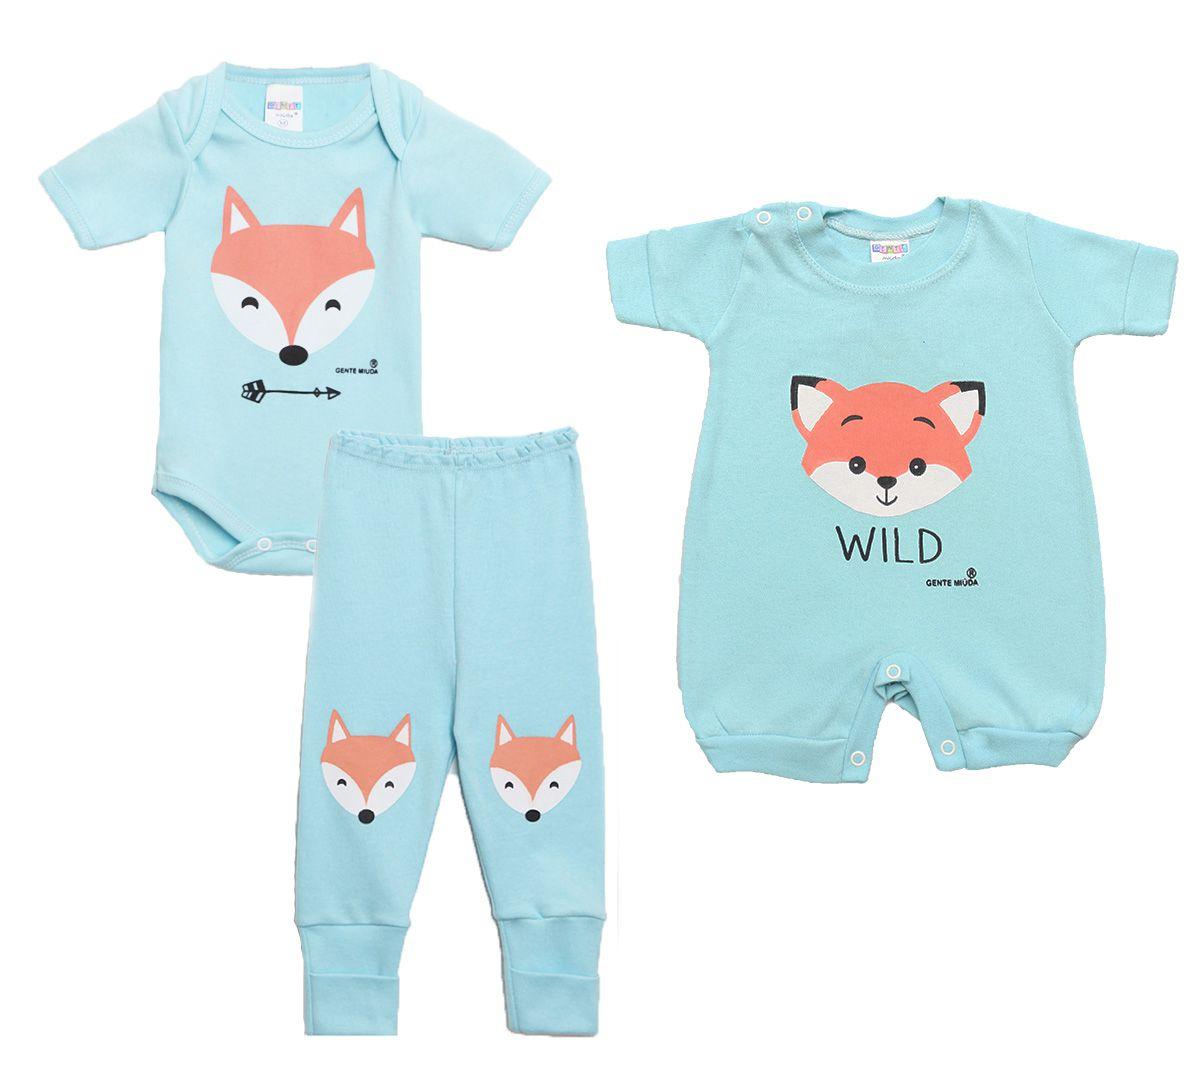 Kit Body Bebê com 3 Peças Menino Raposa Azul Claro